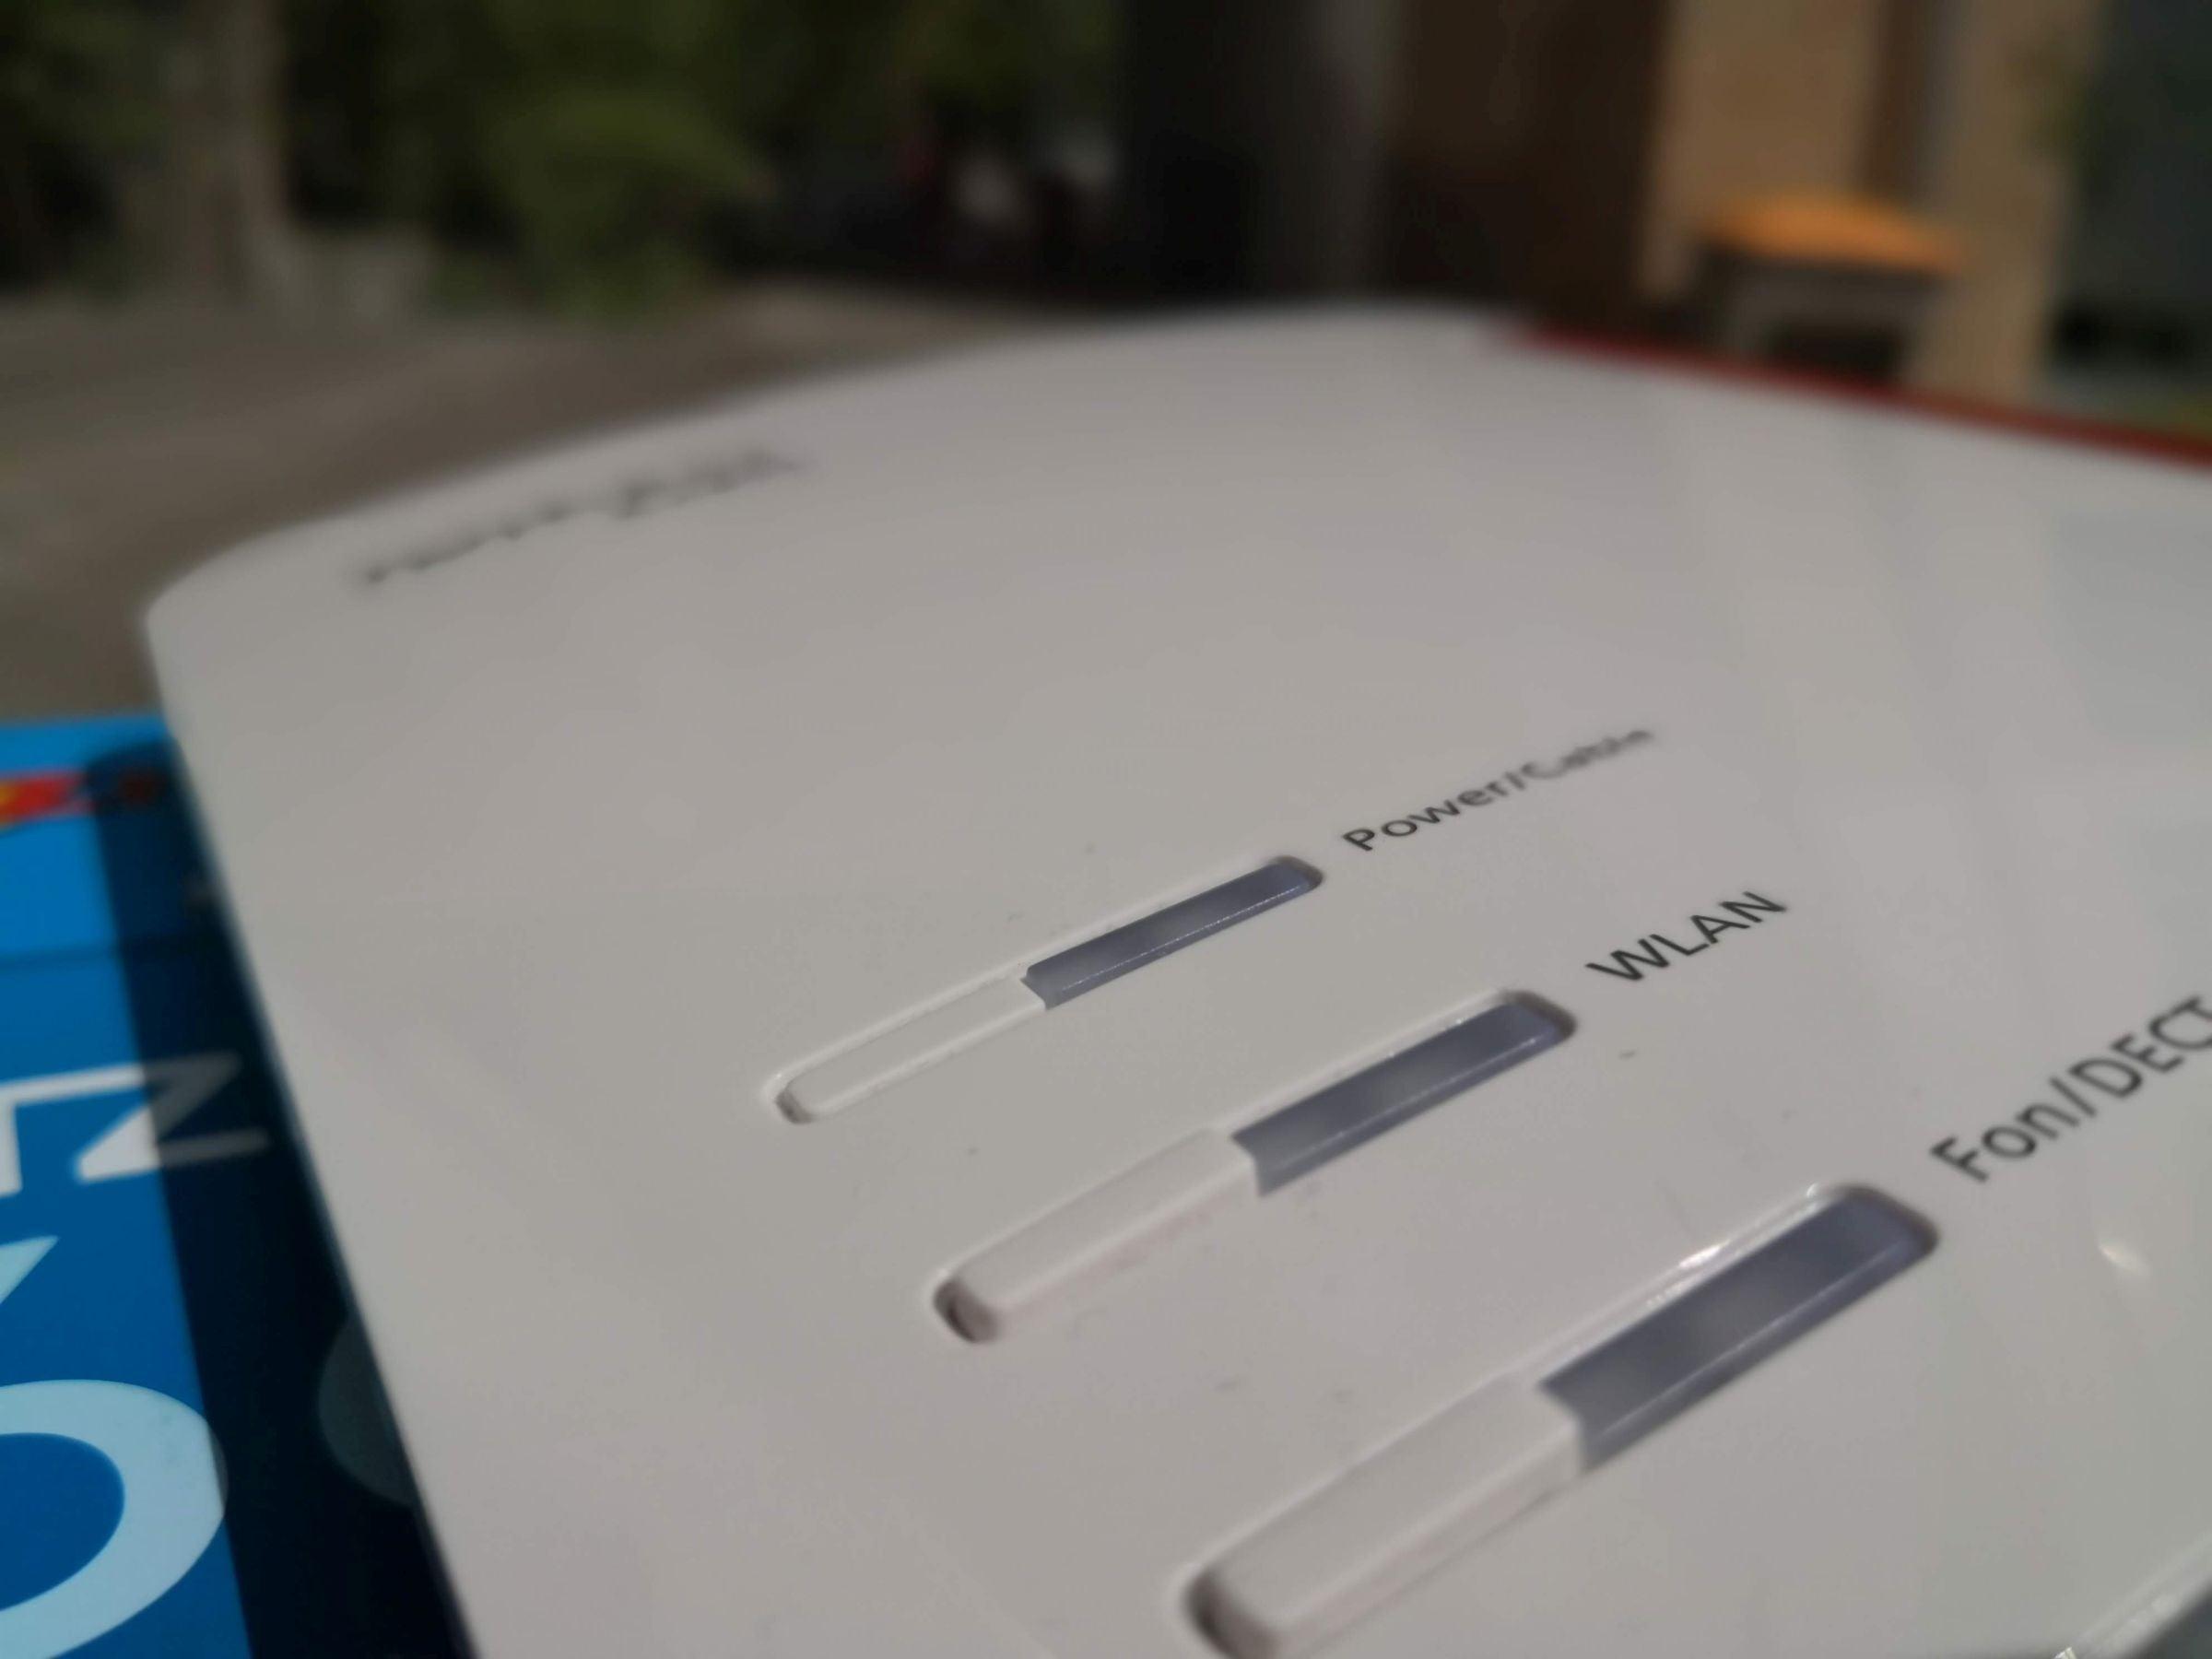 AVM: Software-Update für Kabel-Fritzbox - inside digital